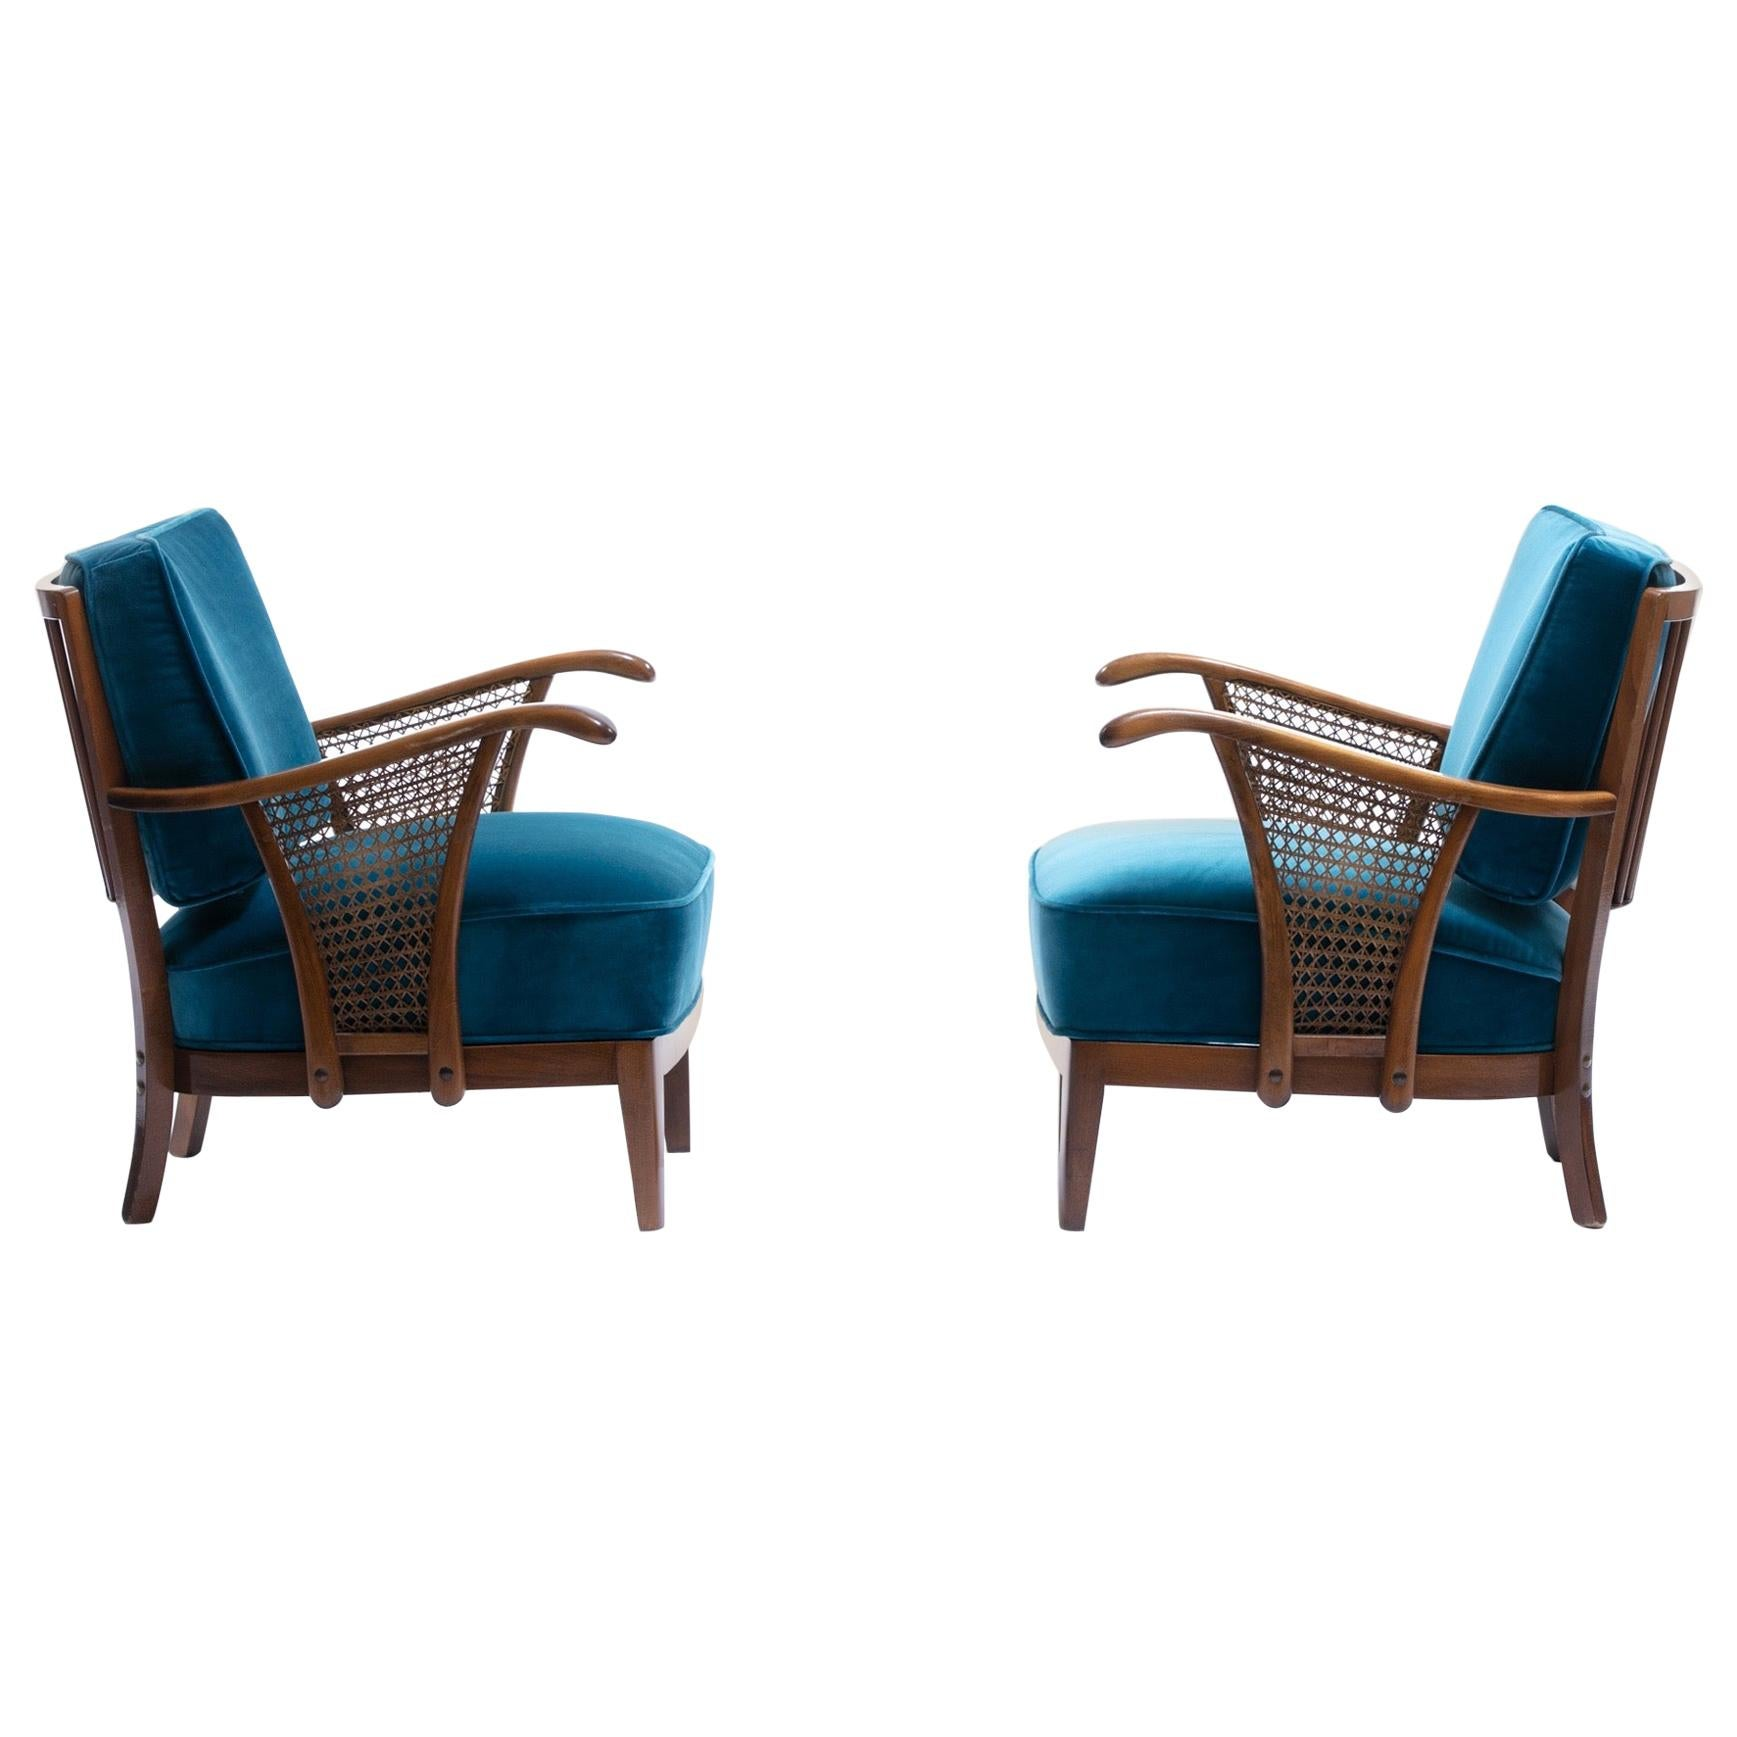 Pair of Scandinavian Lounge Chairs Attributed to Soren Hansen for Fritz Hansen